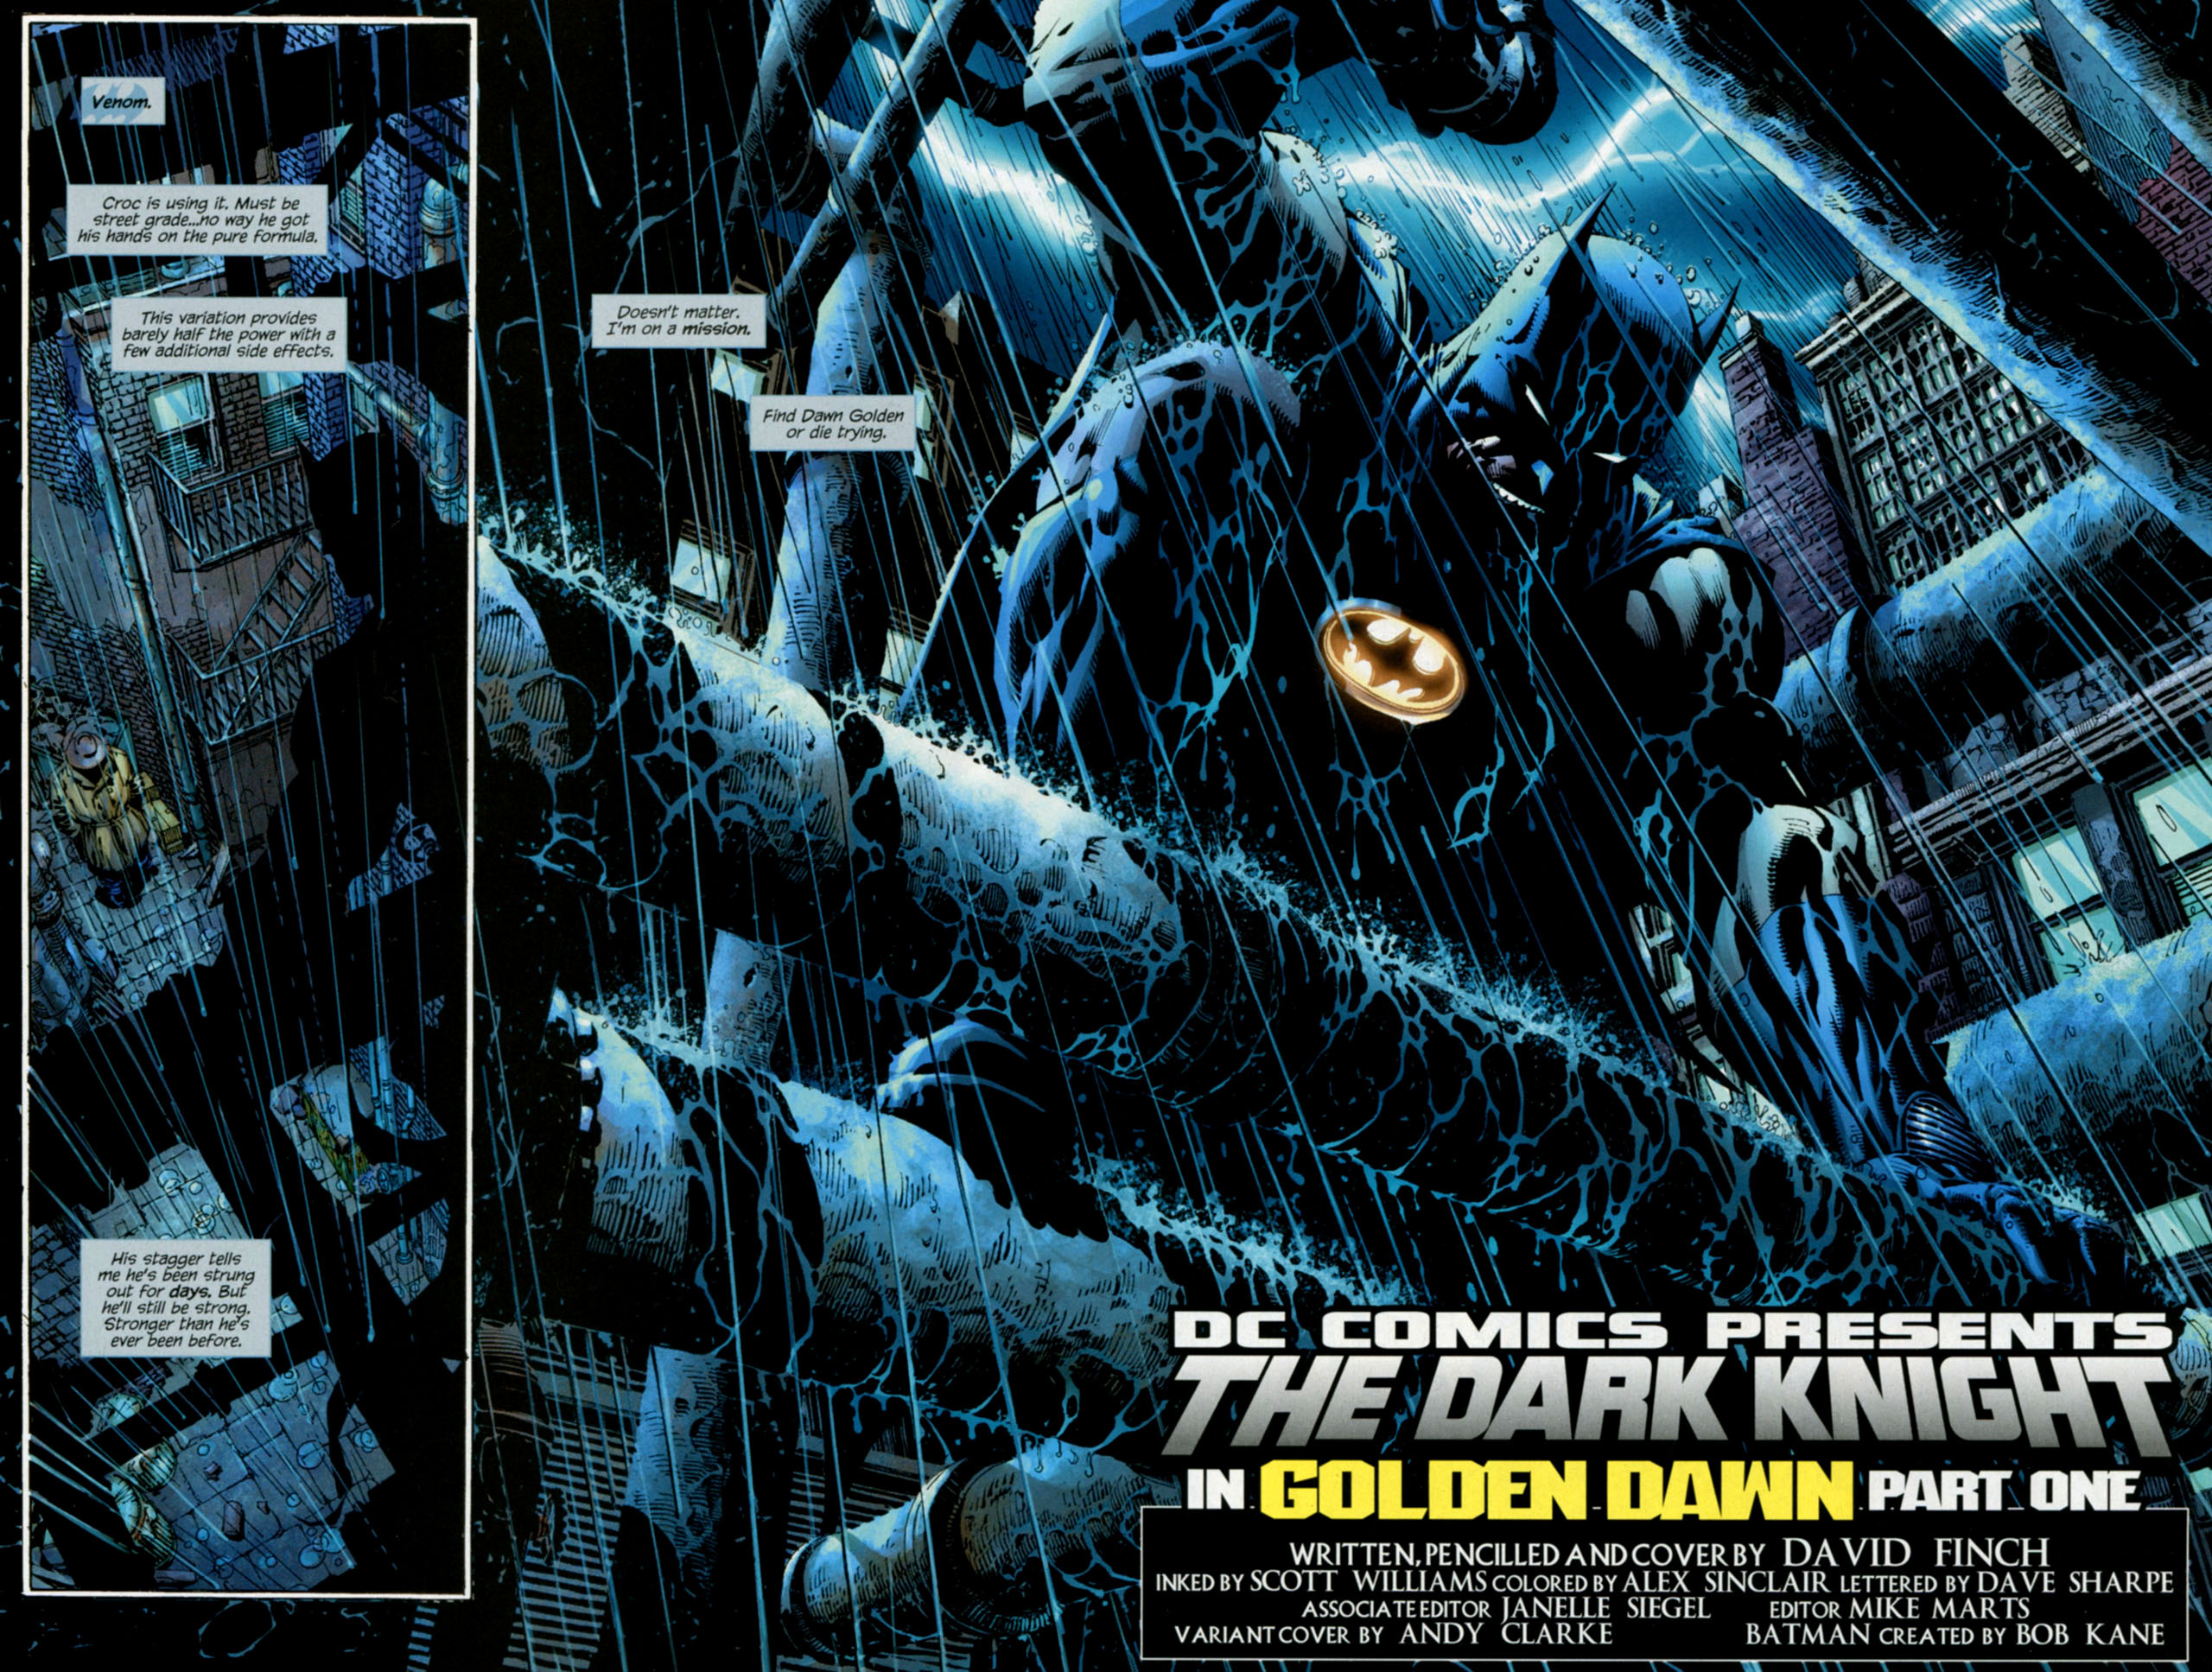 The Dark Knight Golden Dawn Hd Wallpaper